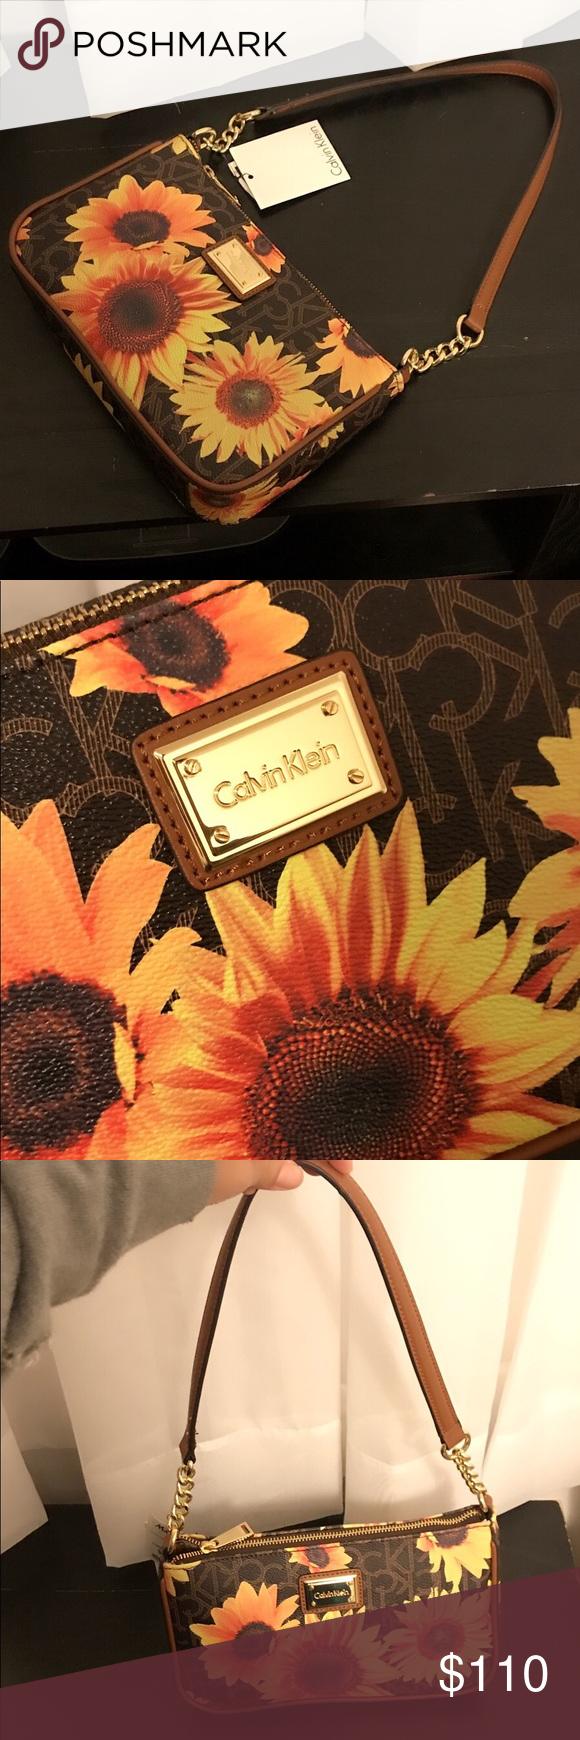 "315e149815c Calvin Klein Sunflower Purse Beautiful sunflowers CK handbag. Brand new.  Bought but never used. Size: 10""x6.5""x2"" Handle drop: 11"" Calvin Klein Bags"